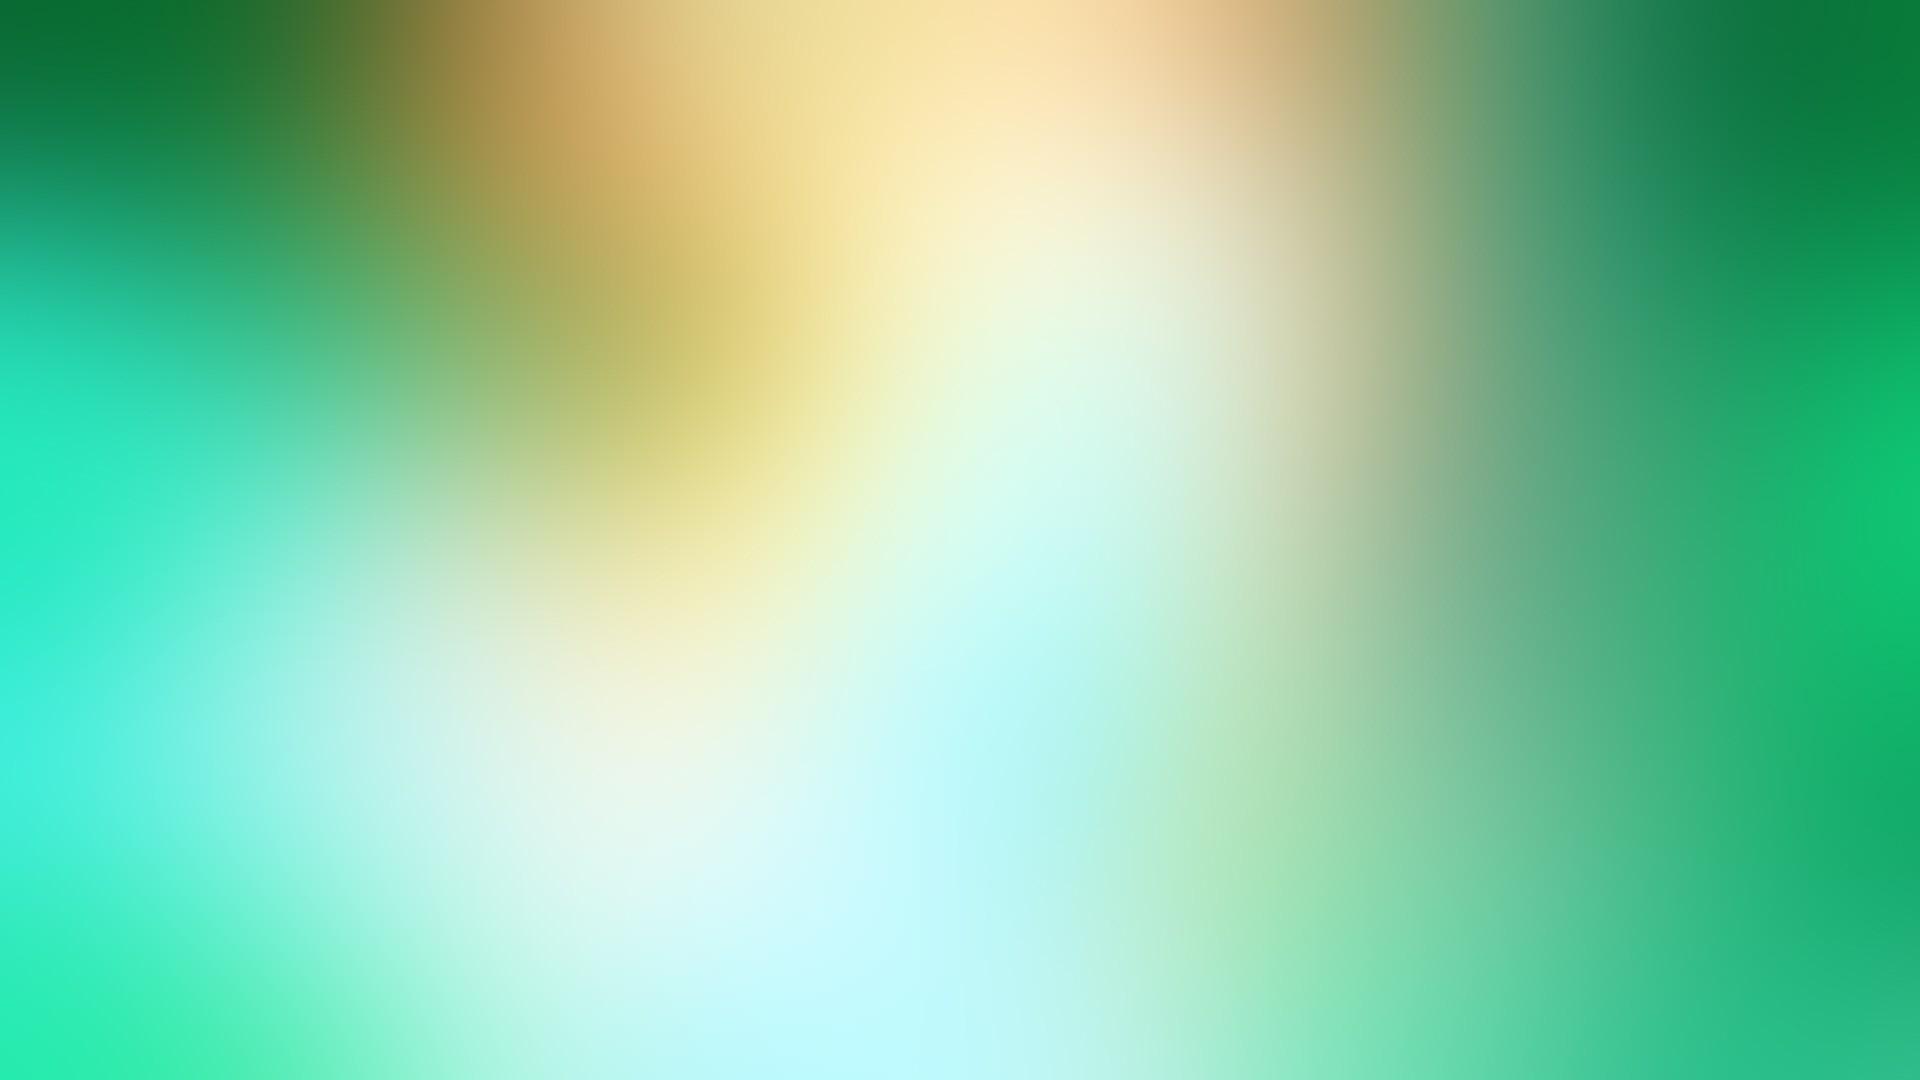 Bright Solid Color Wallpaper